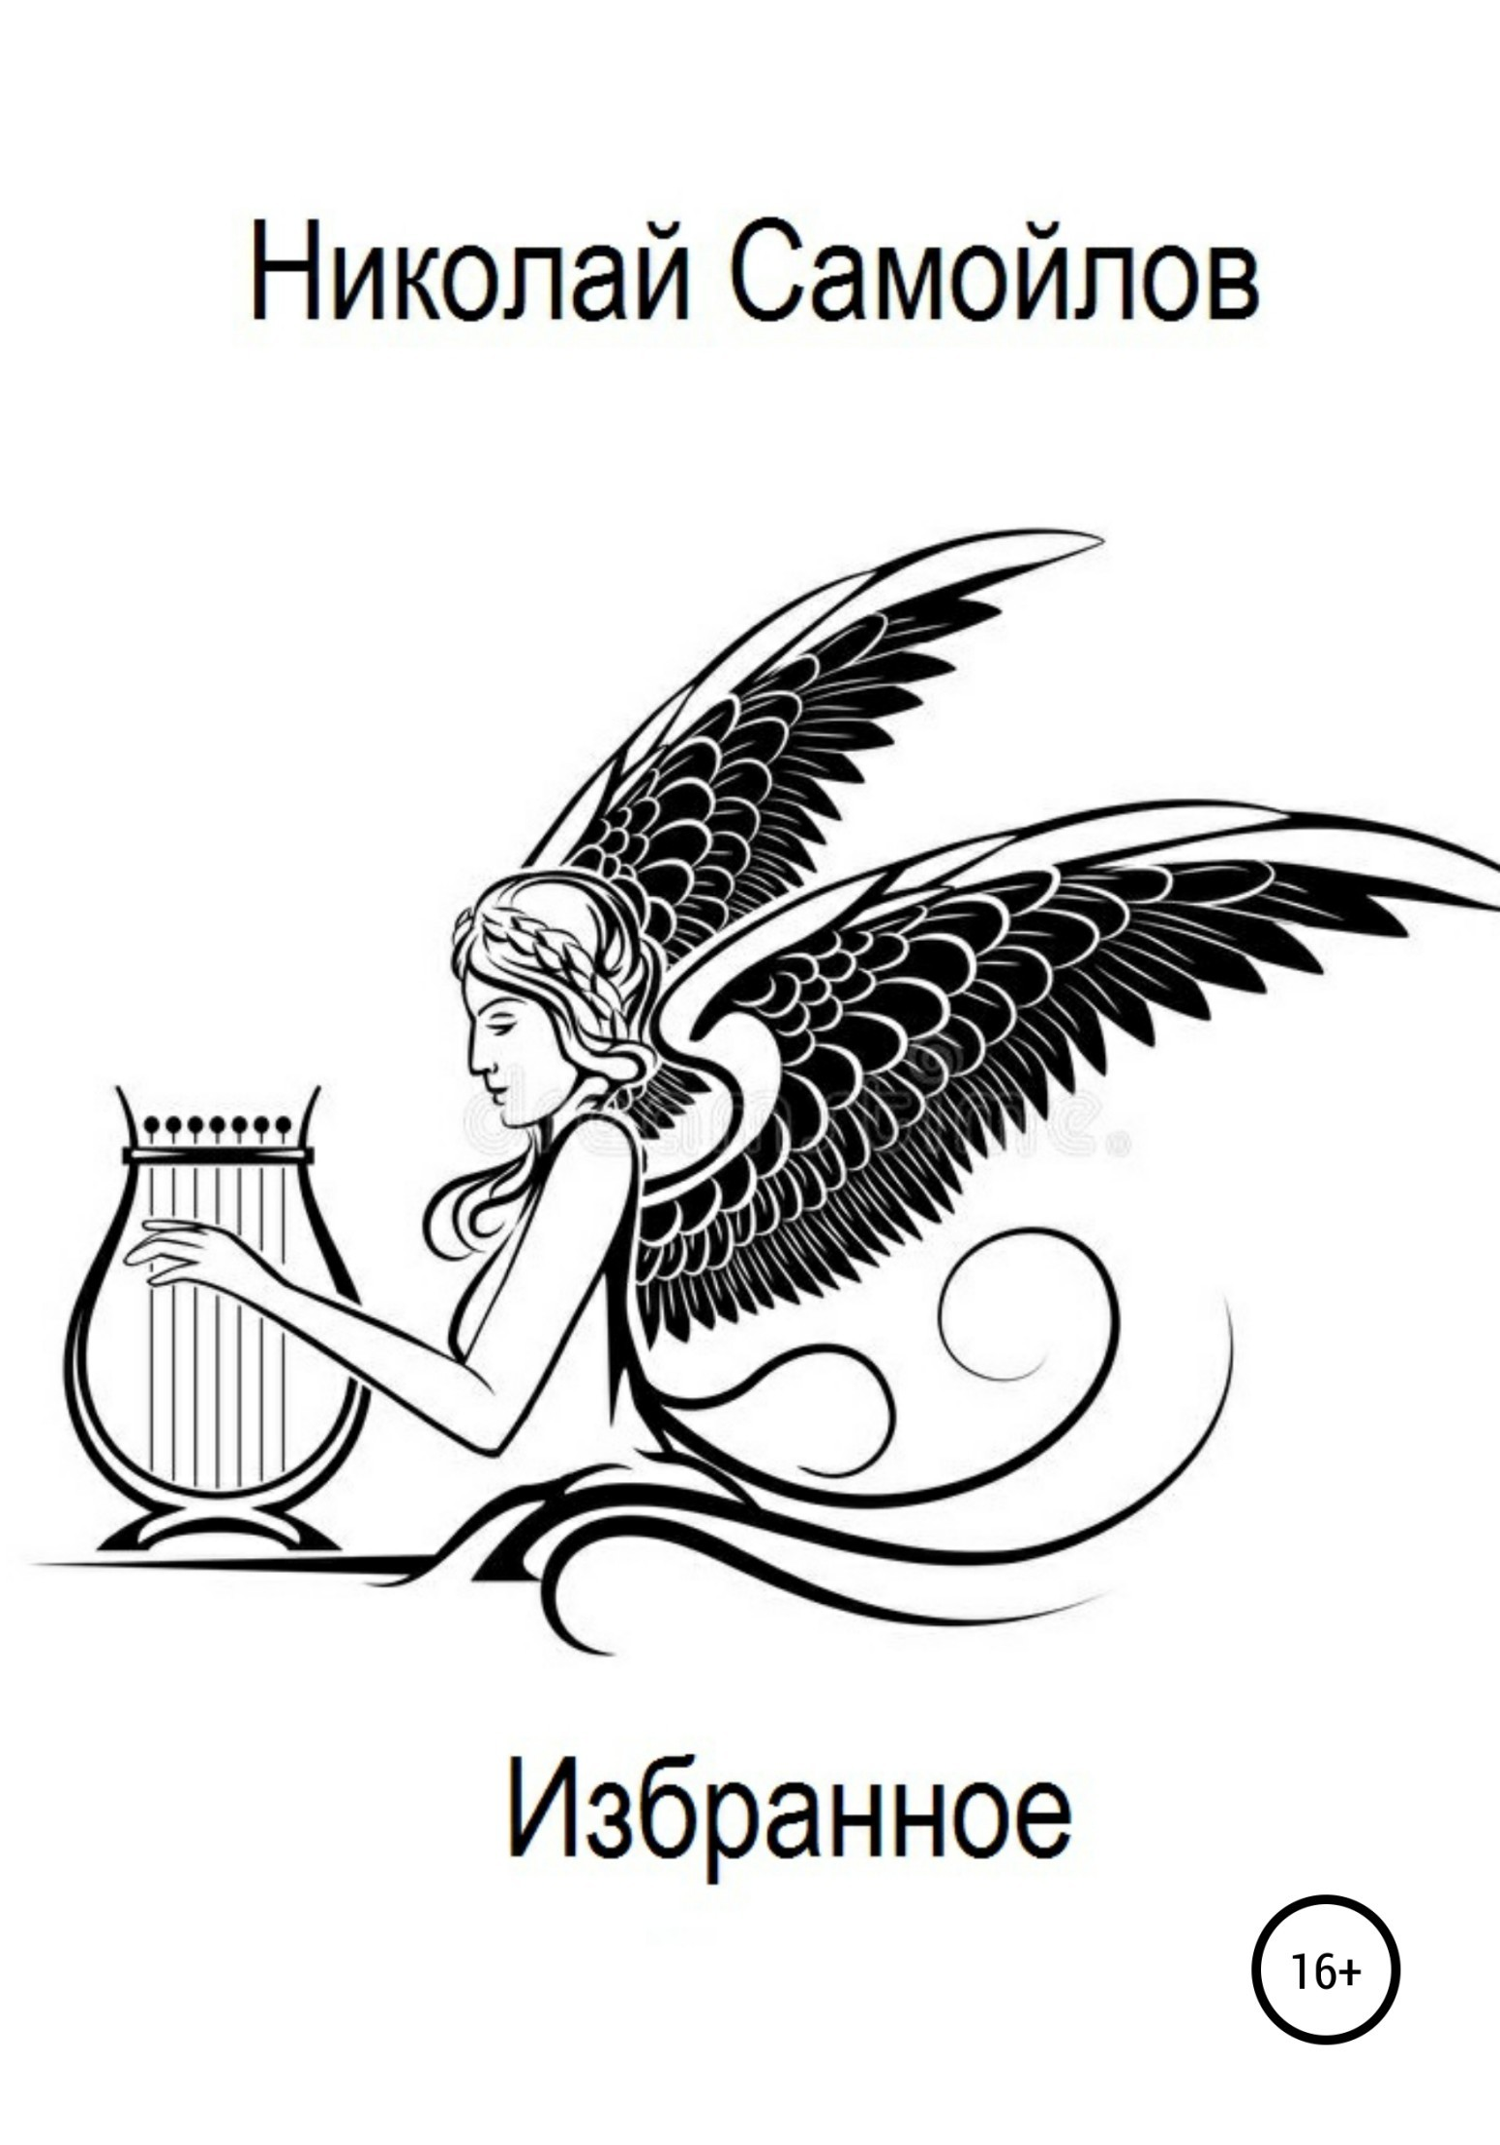 Николай Николаевич Самойлов Избранное цена и фото